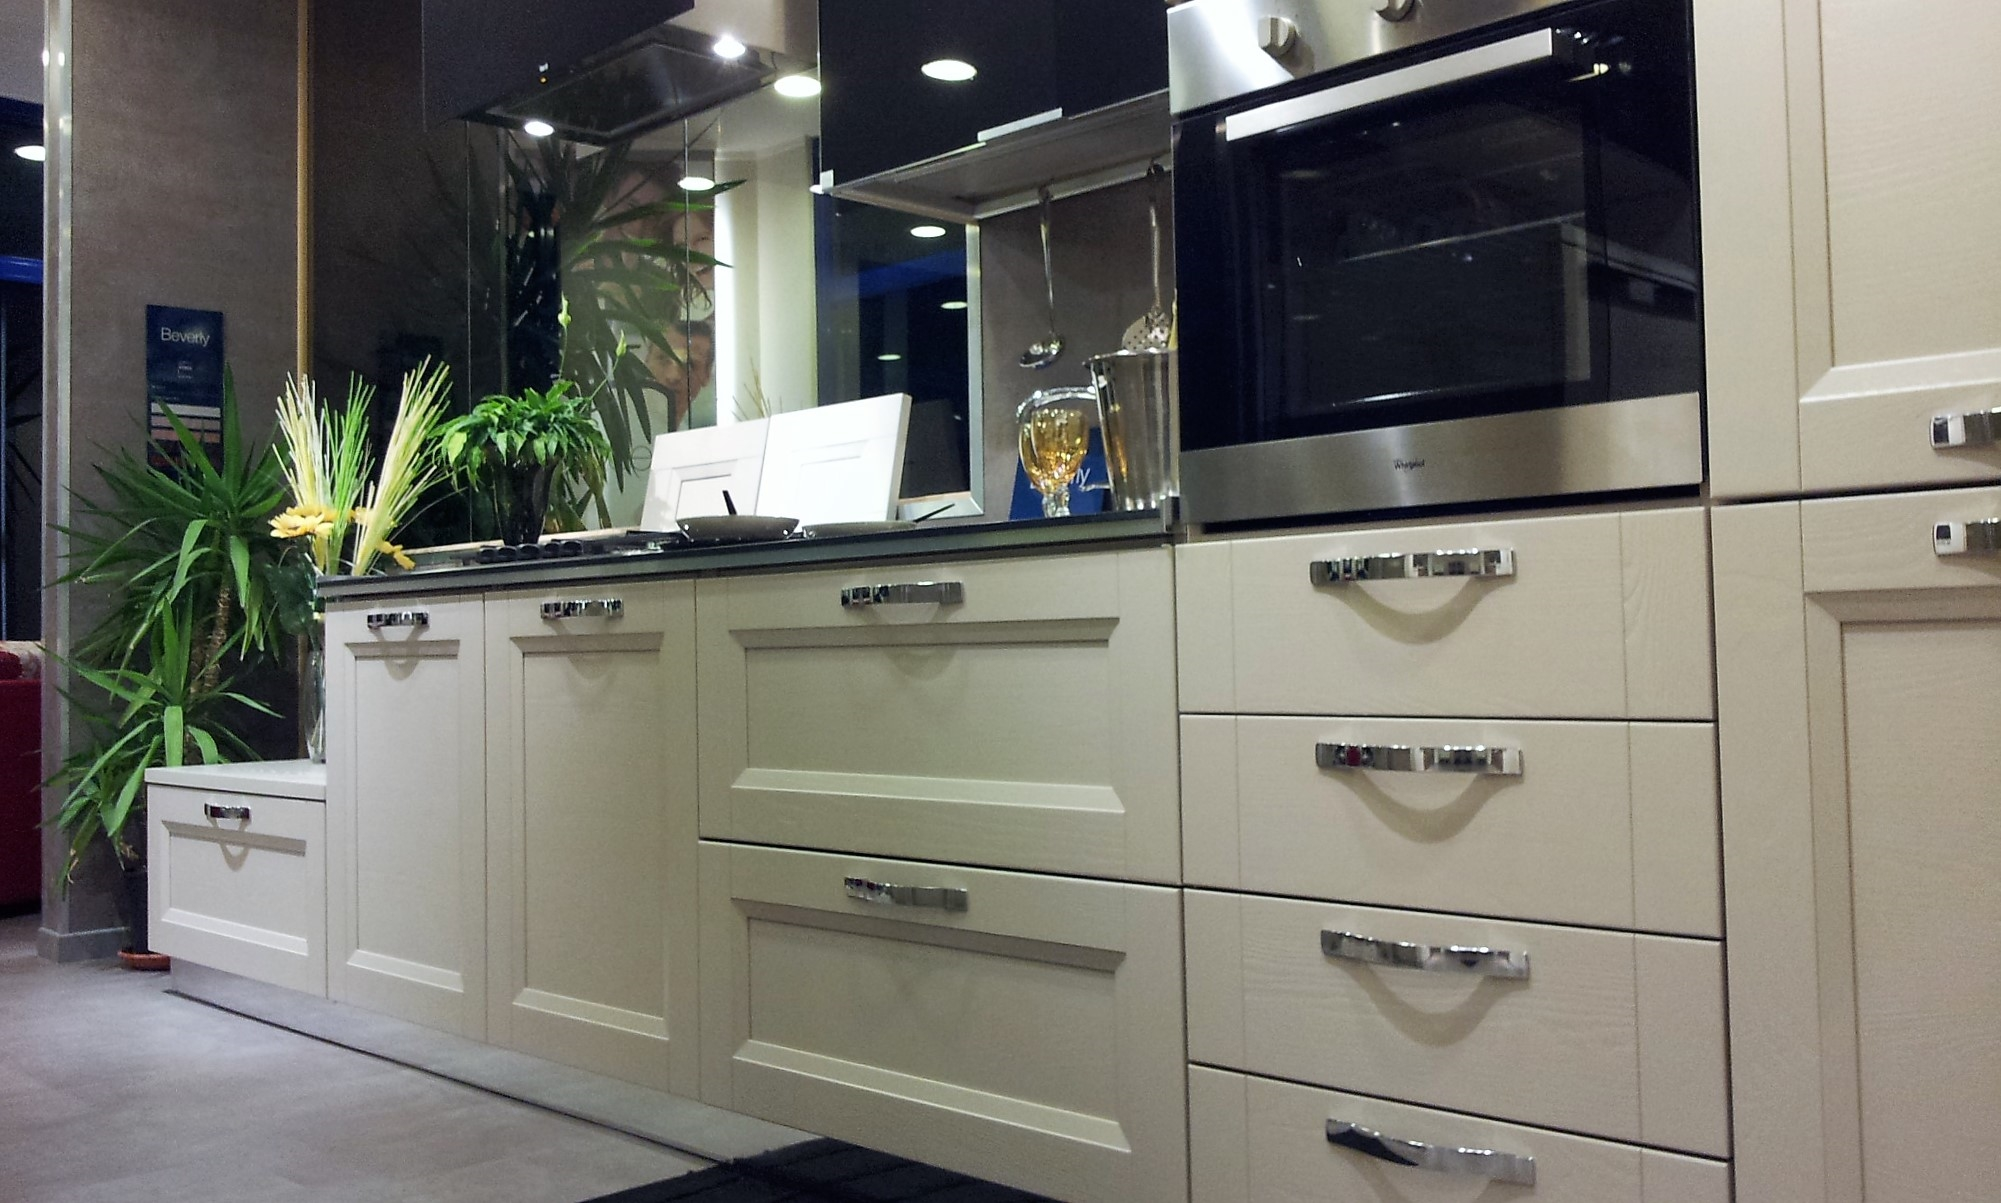 Cucina stosa cucine beverly canapa scontato del 61 cucine a prezzi scontati - Cucina beverly stosa prezzi ...